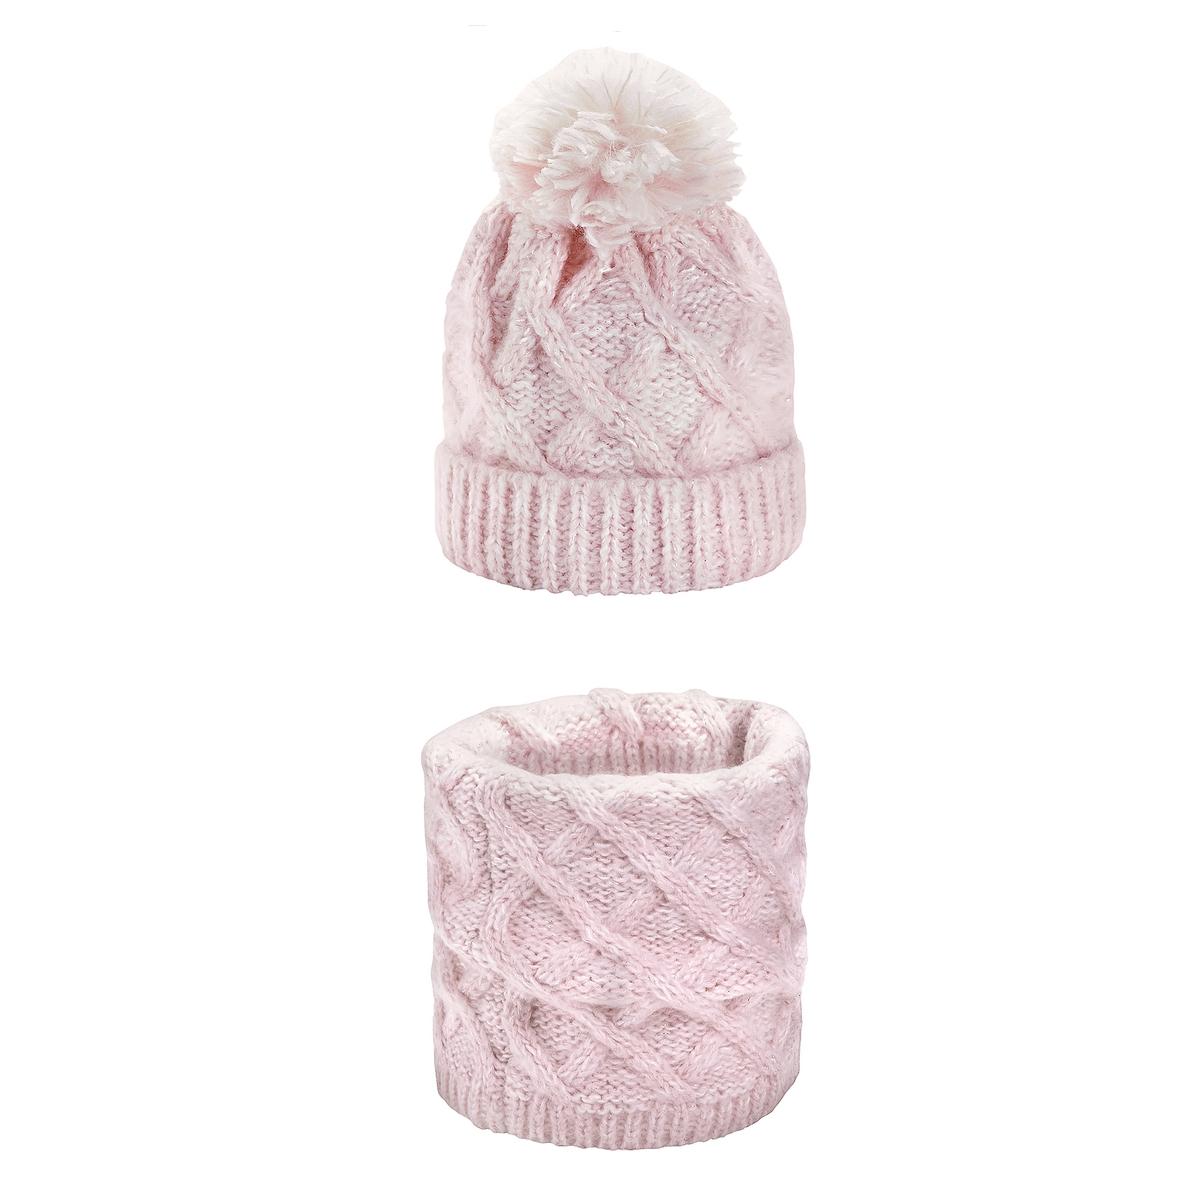 цены Комплект из шапочки и шарфа La Redoute La Redoute 56 см розовый